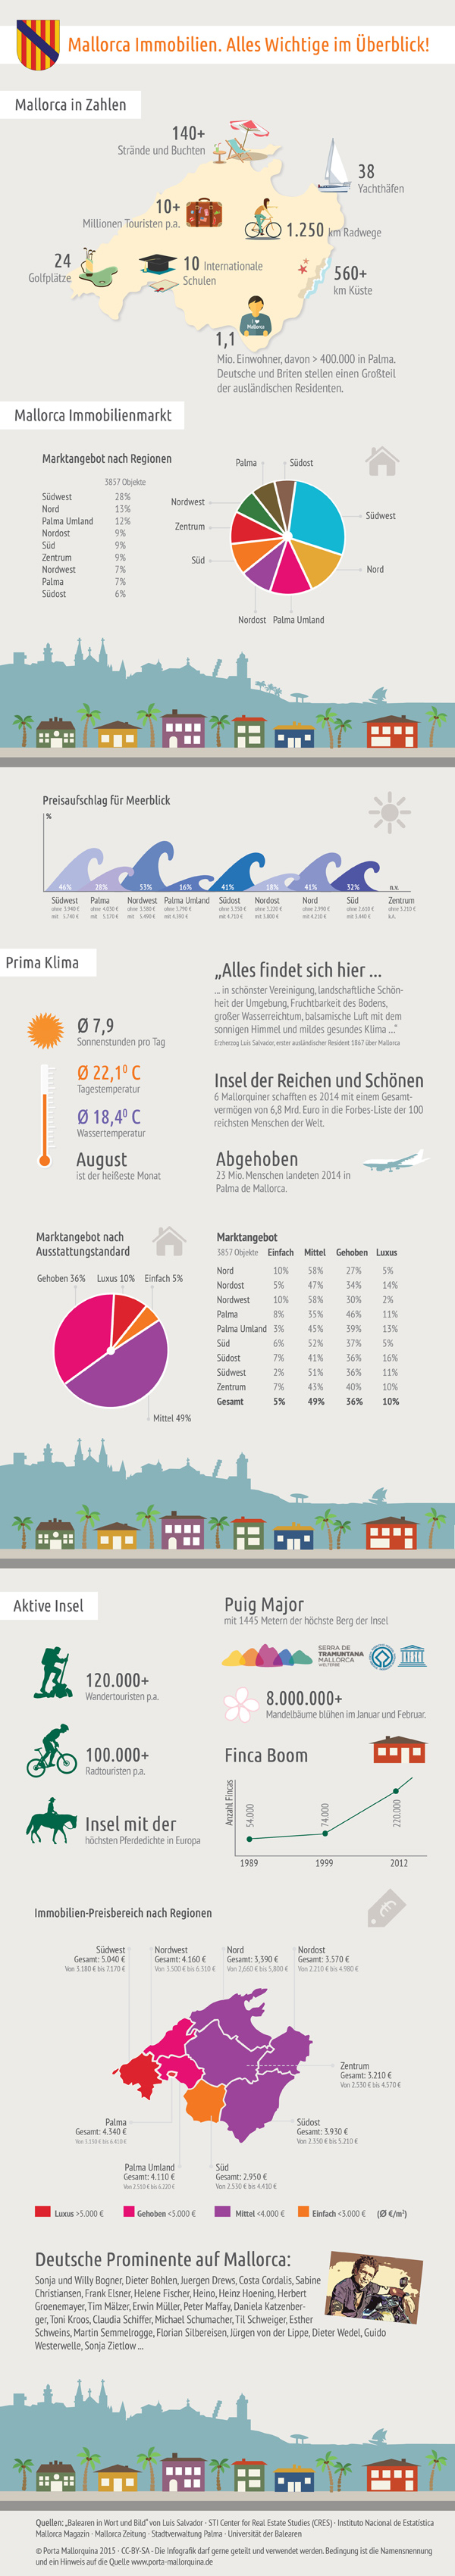 mallorca-immobilien-infografik